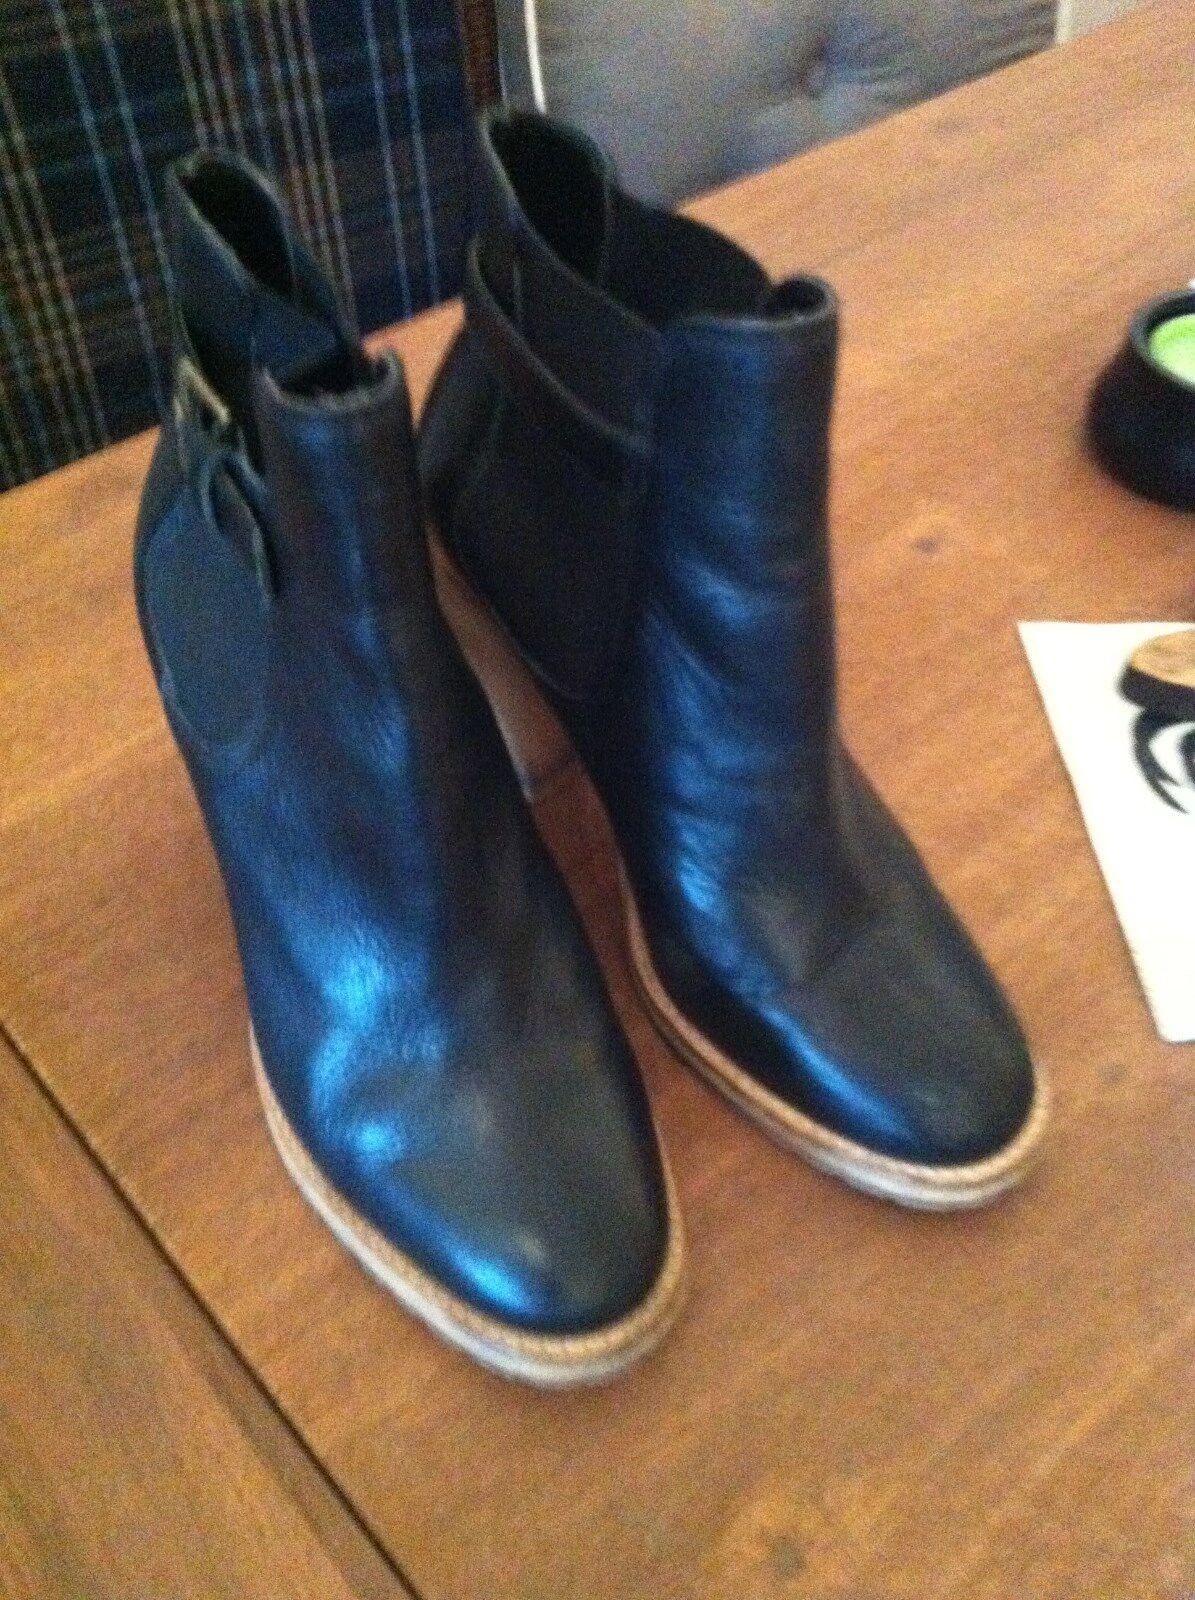 Buffalo Stiefeletten Leder schwarz helle Bbsätze Stretch Gr. 37